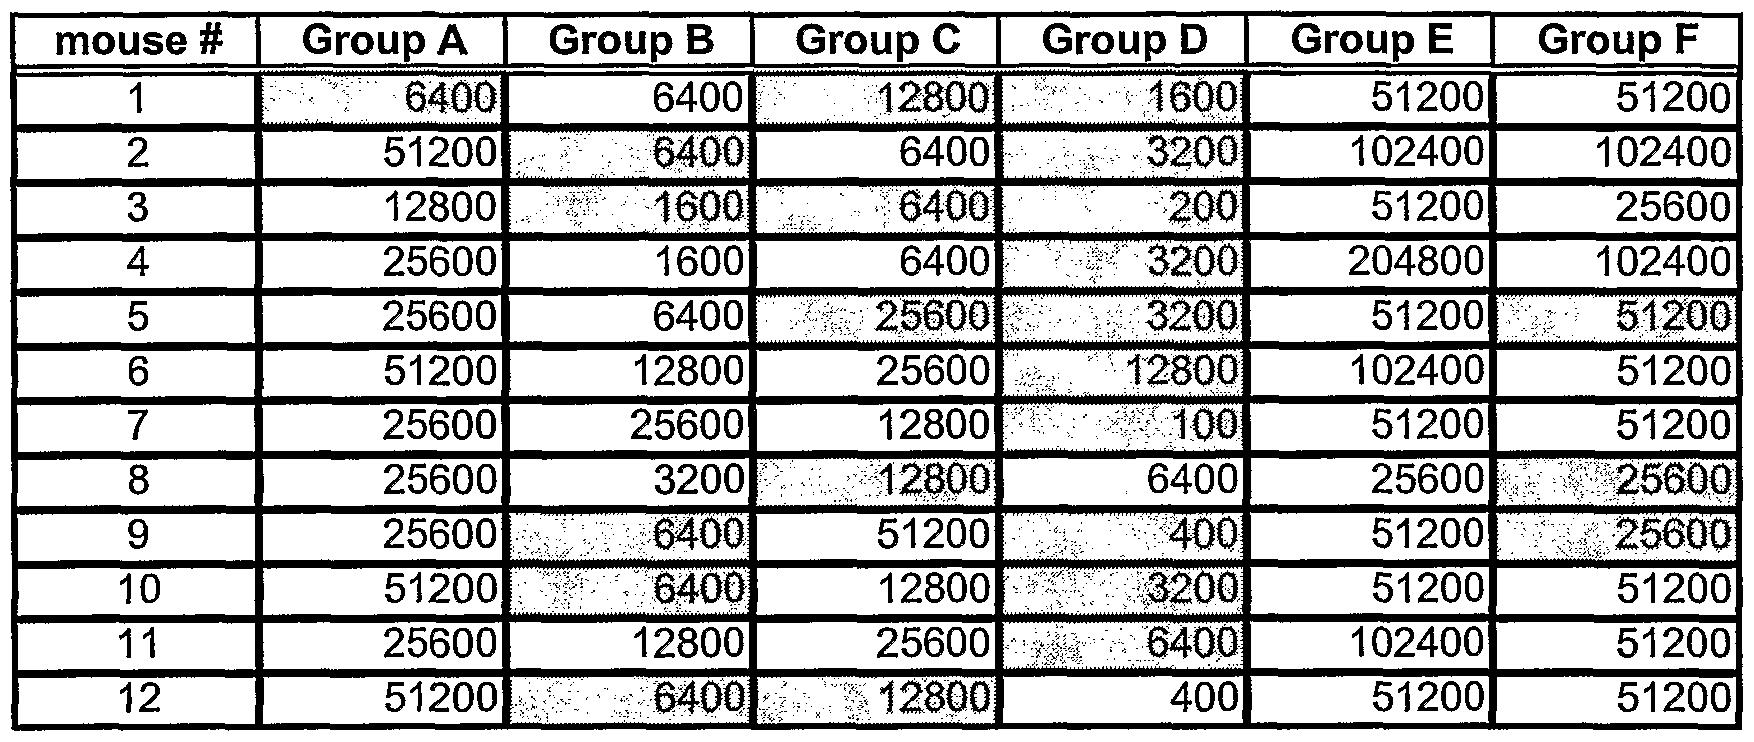 Wo2005116270A2 – Influenza Virus Vaccine Composition And Throughout Gcu Academic Calendar 2021 20